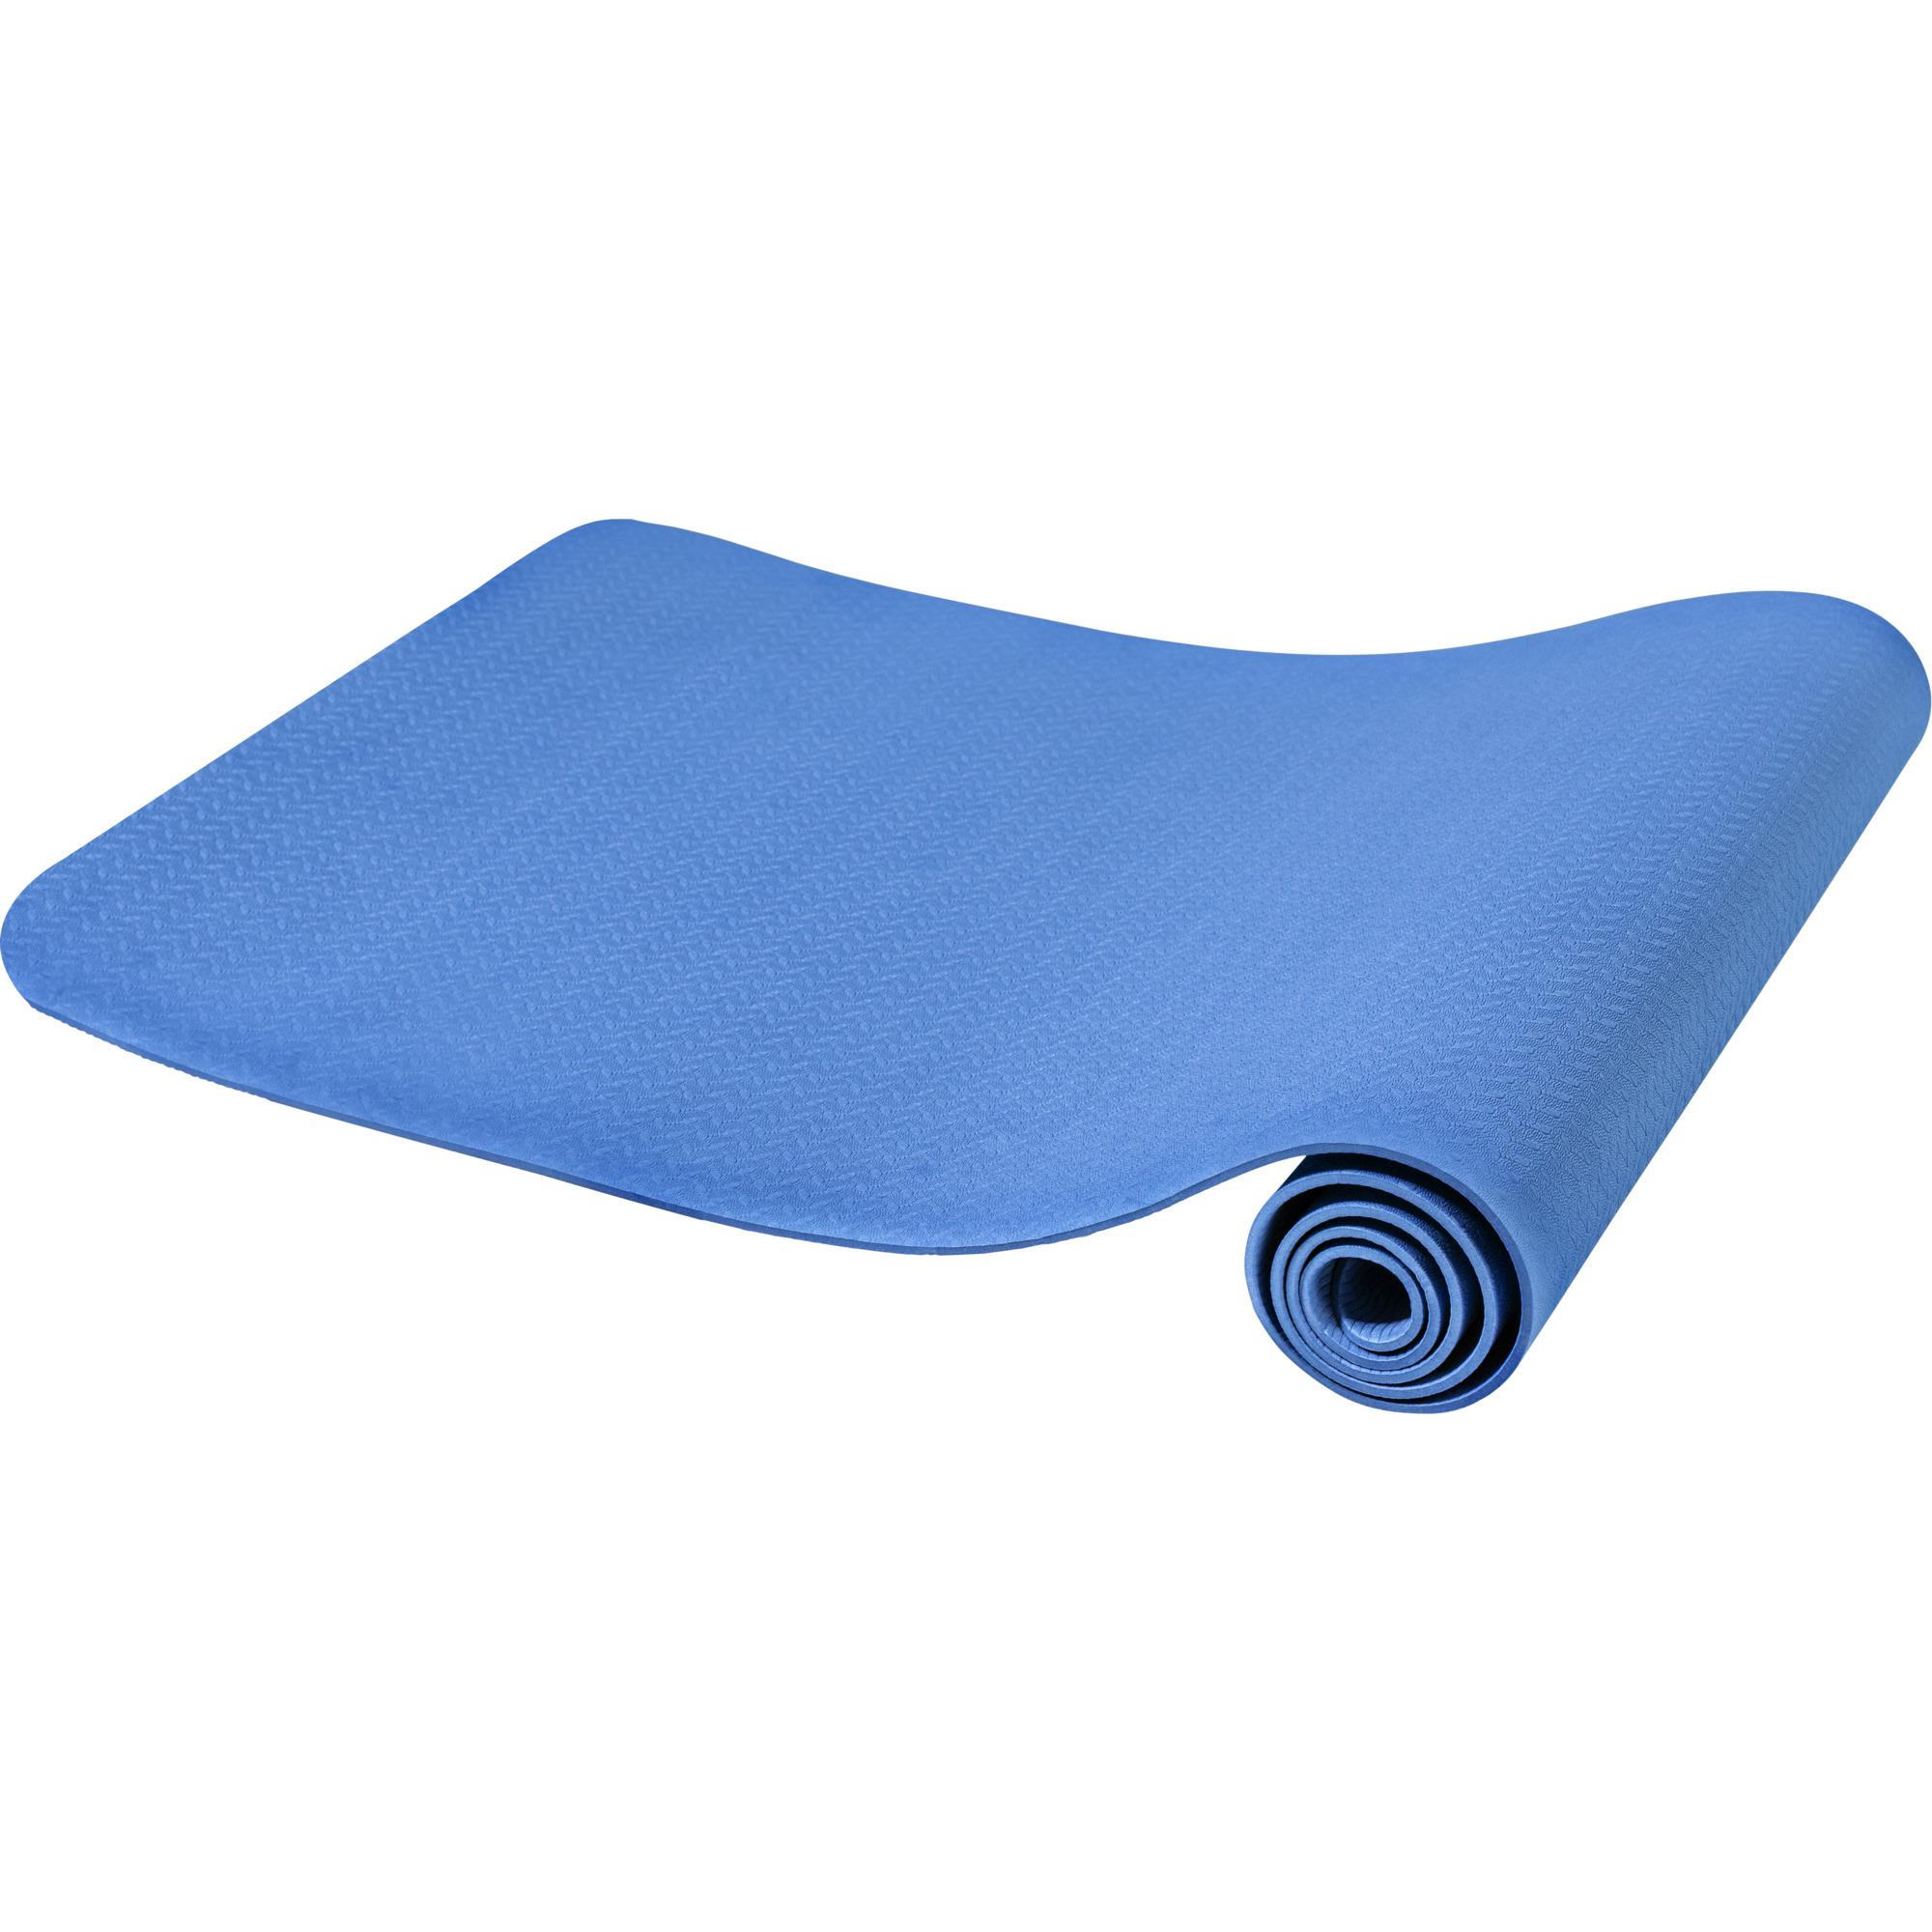 Yogamatte Dünn Blau 4 mm